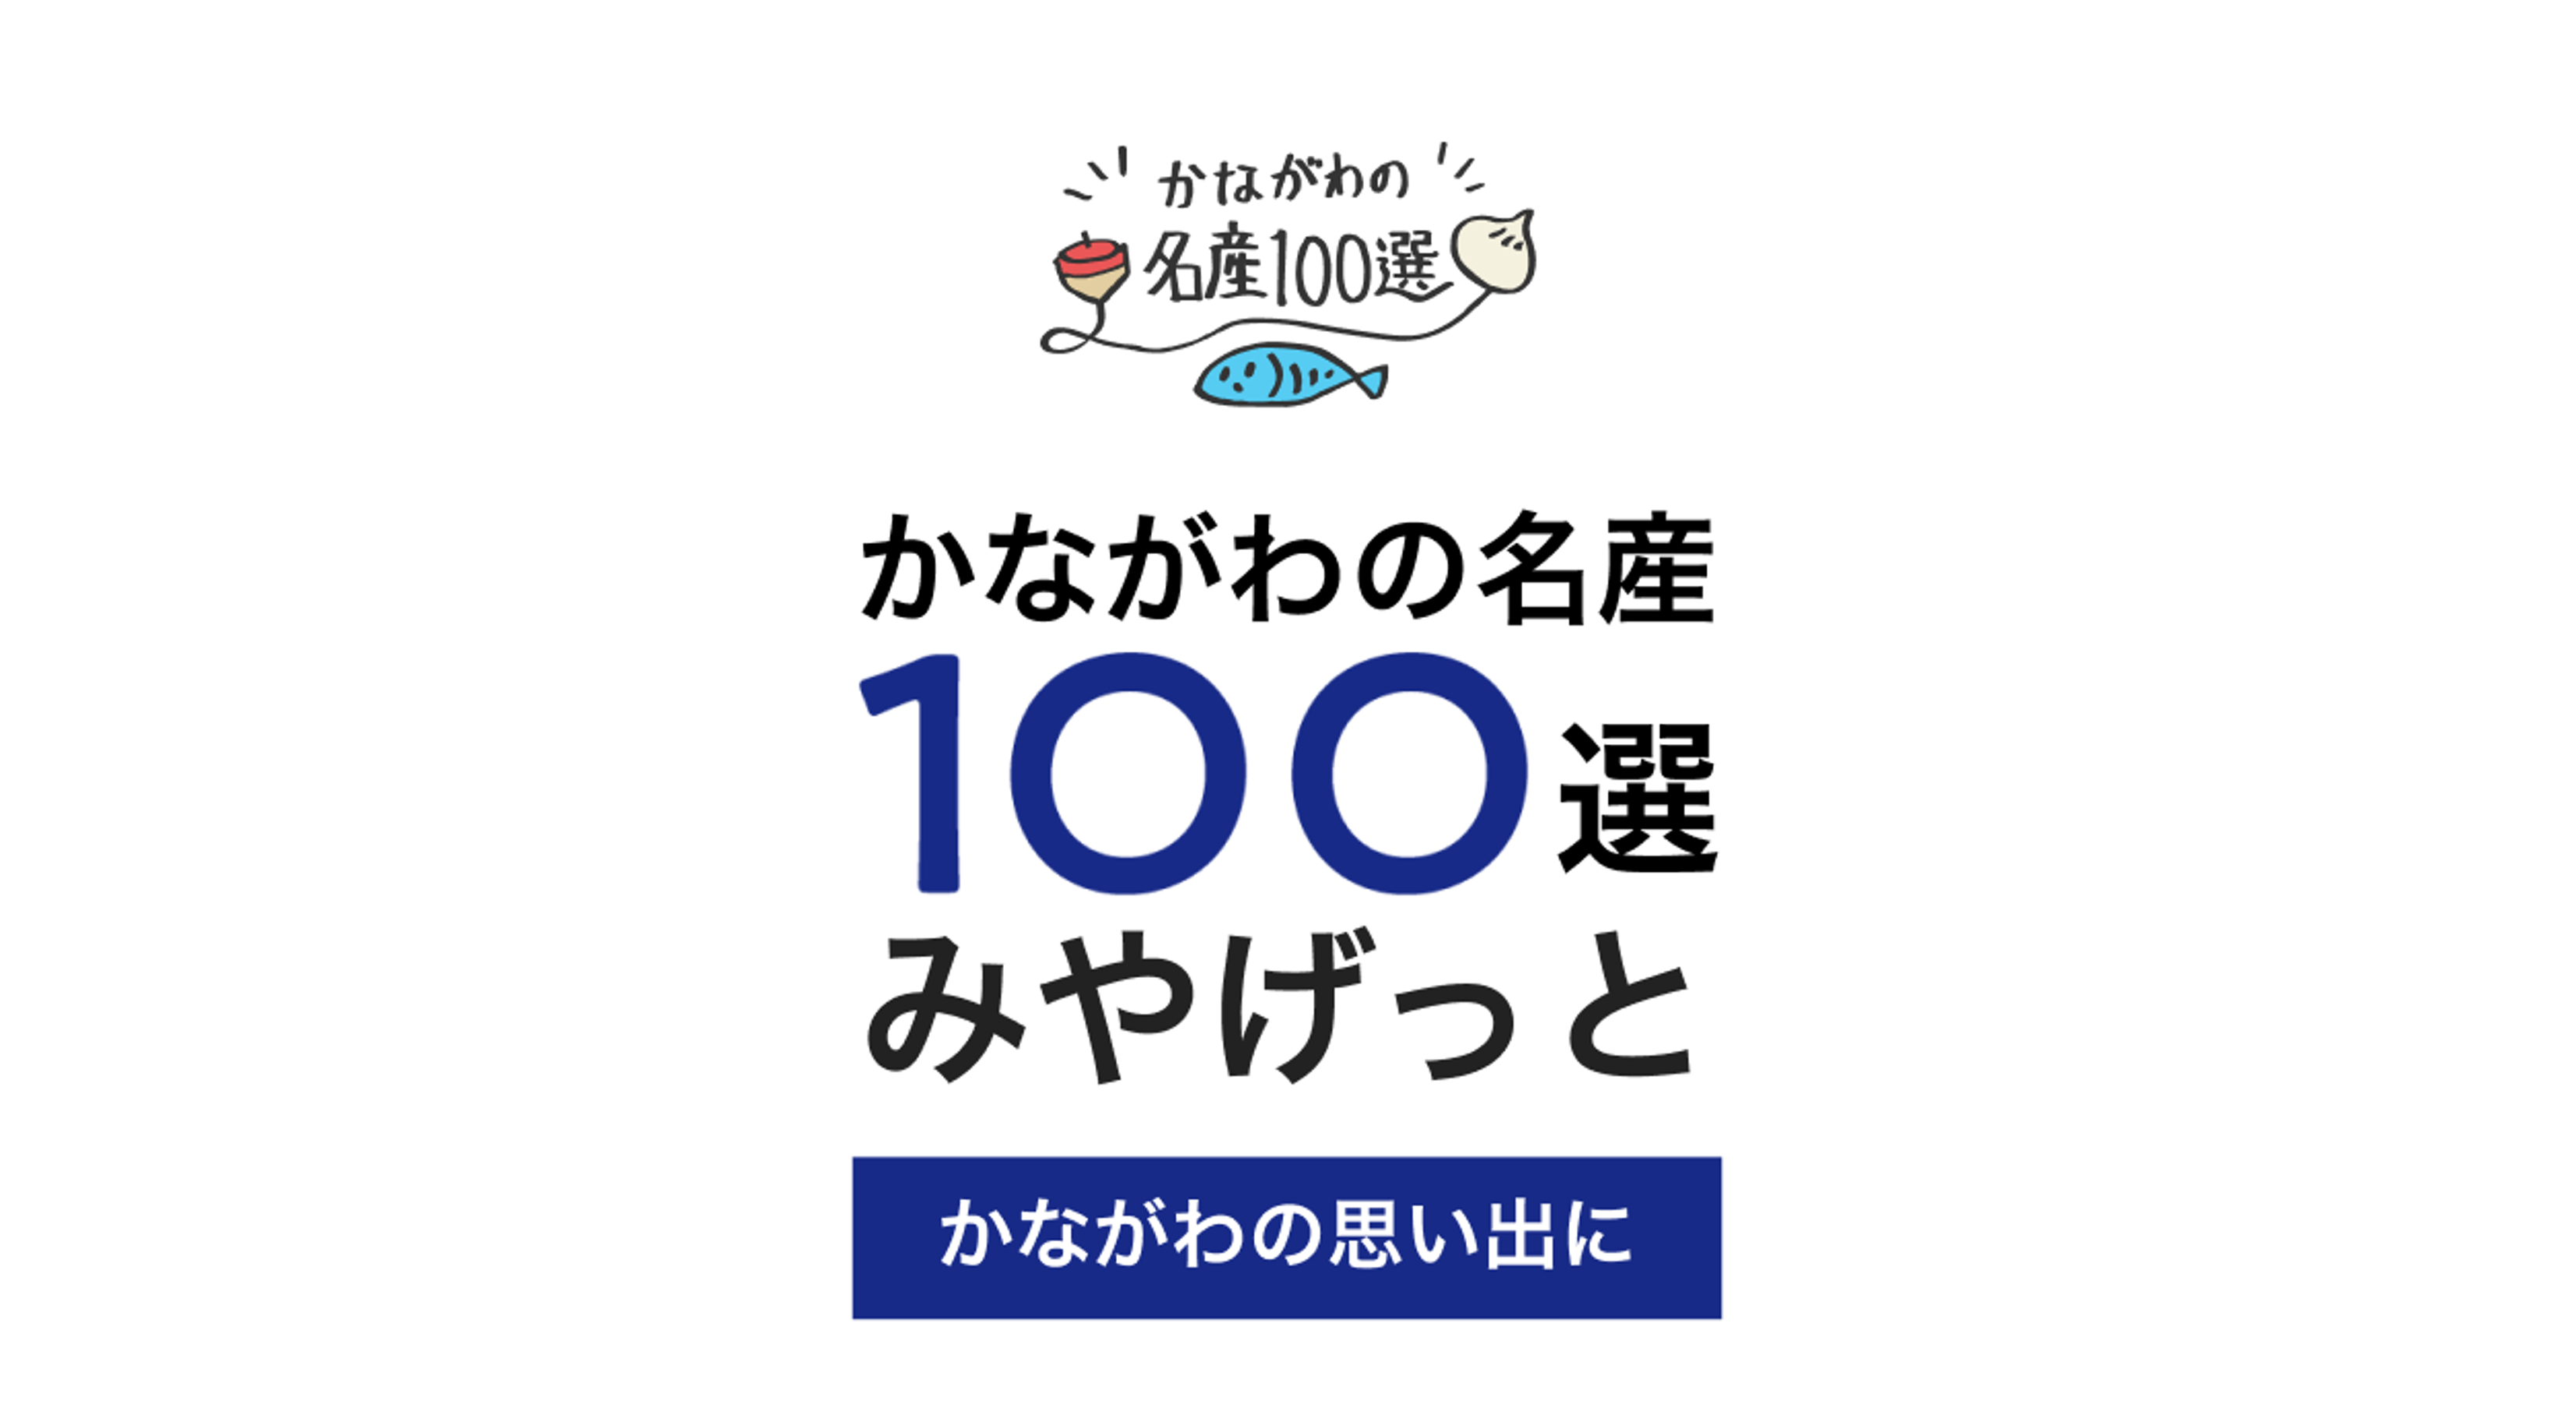 【NEWS】「かながわの名産100選」オンライン販売サイトがオープン